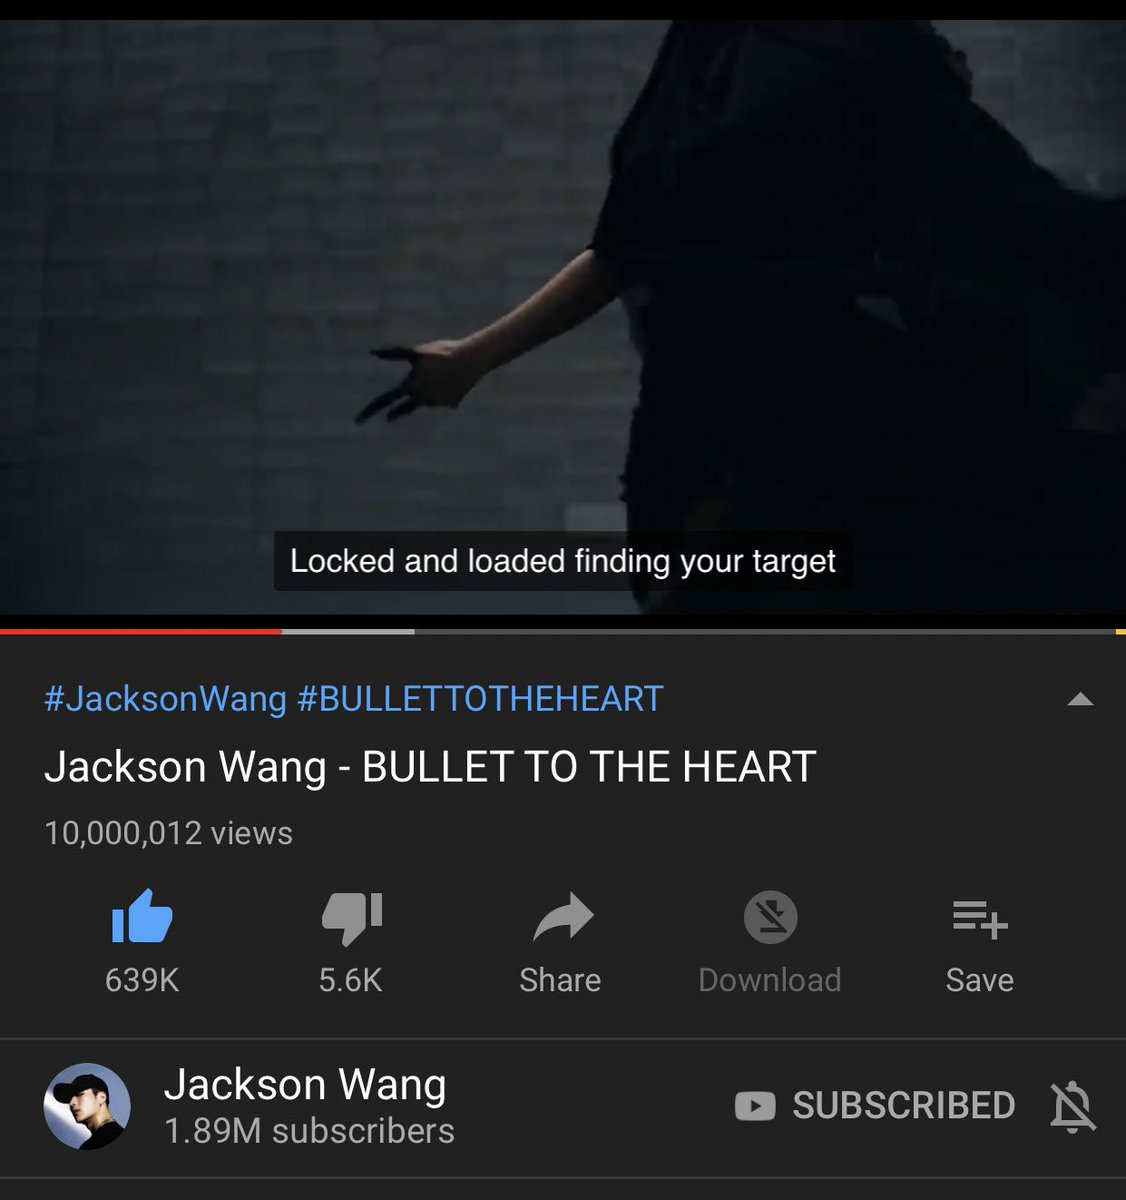 Wheeeeeee. 10 M views!!!  Congratulations  @JacksonWang852 #JacksonWang1stAlbum #BULLETTOTHEHEART #JacksonWang #Mirrors<br>http://pic.twitter.com/HUnXenUmpM